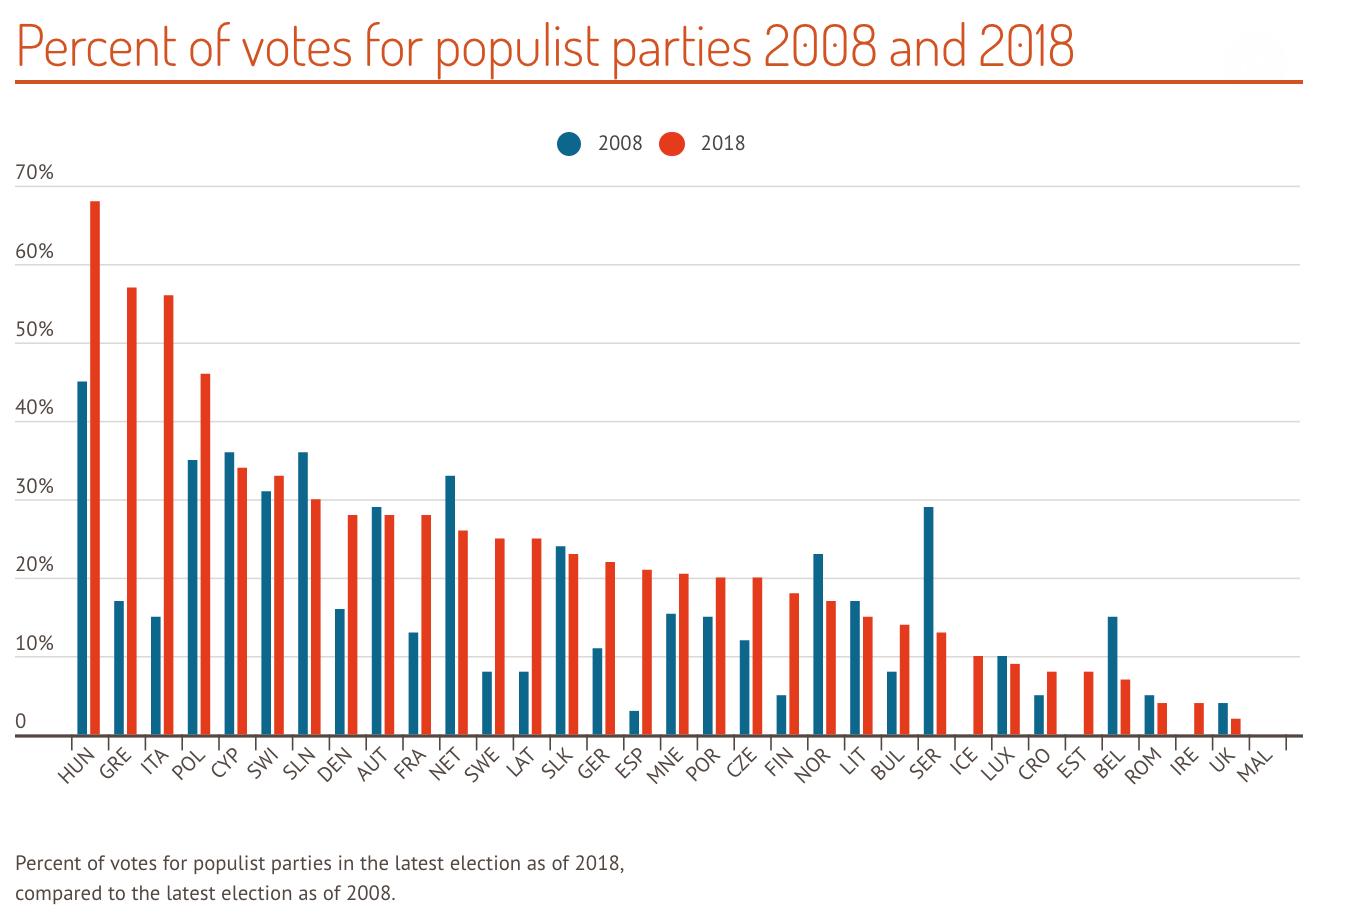 indice-de-populismo-4.png